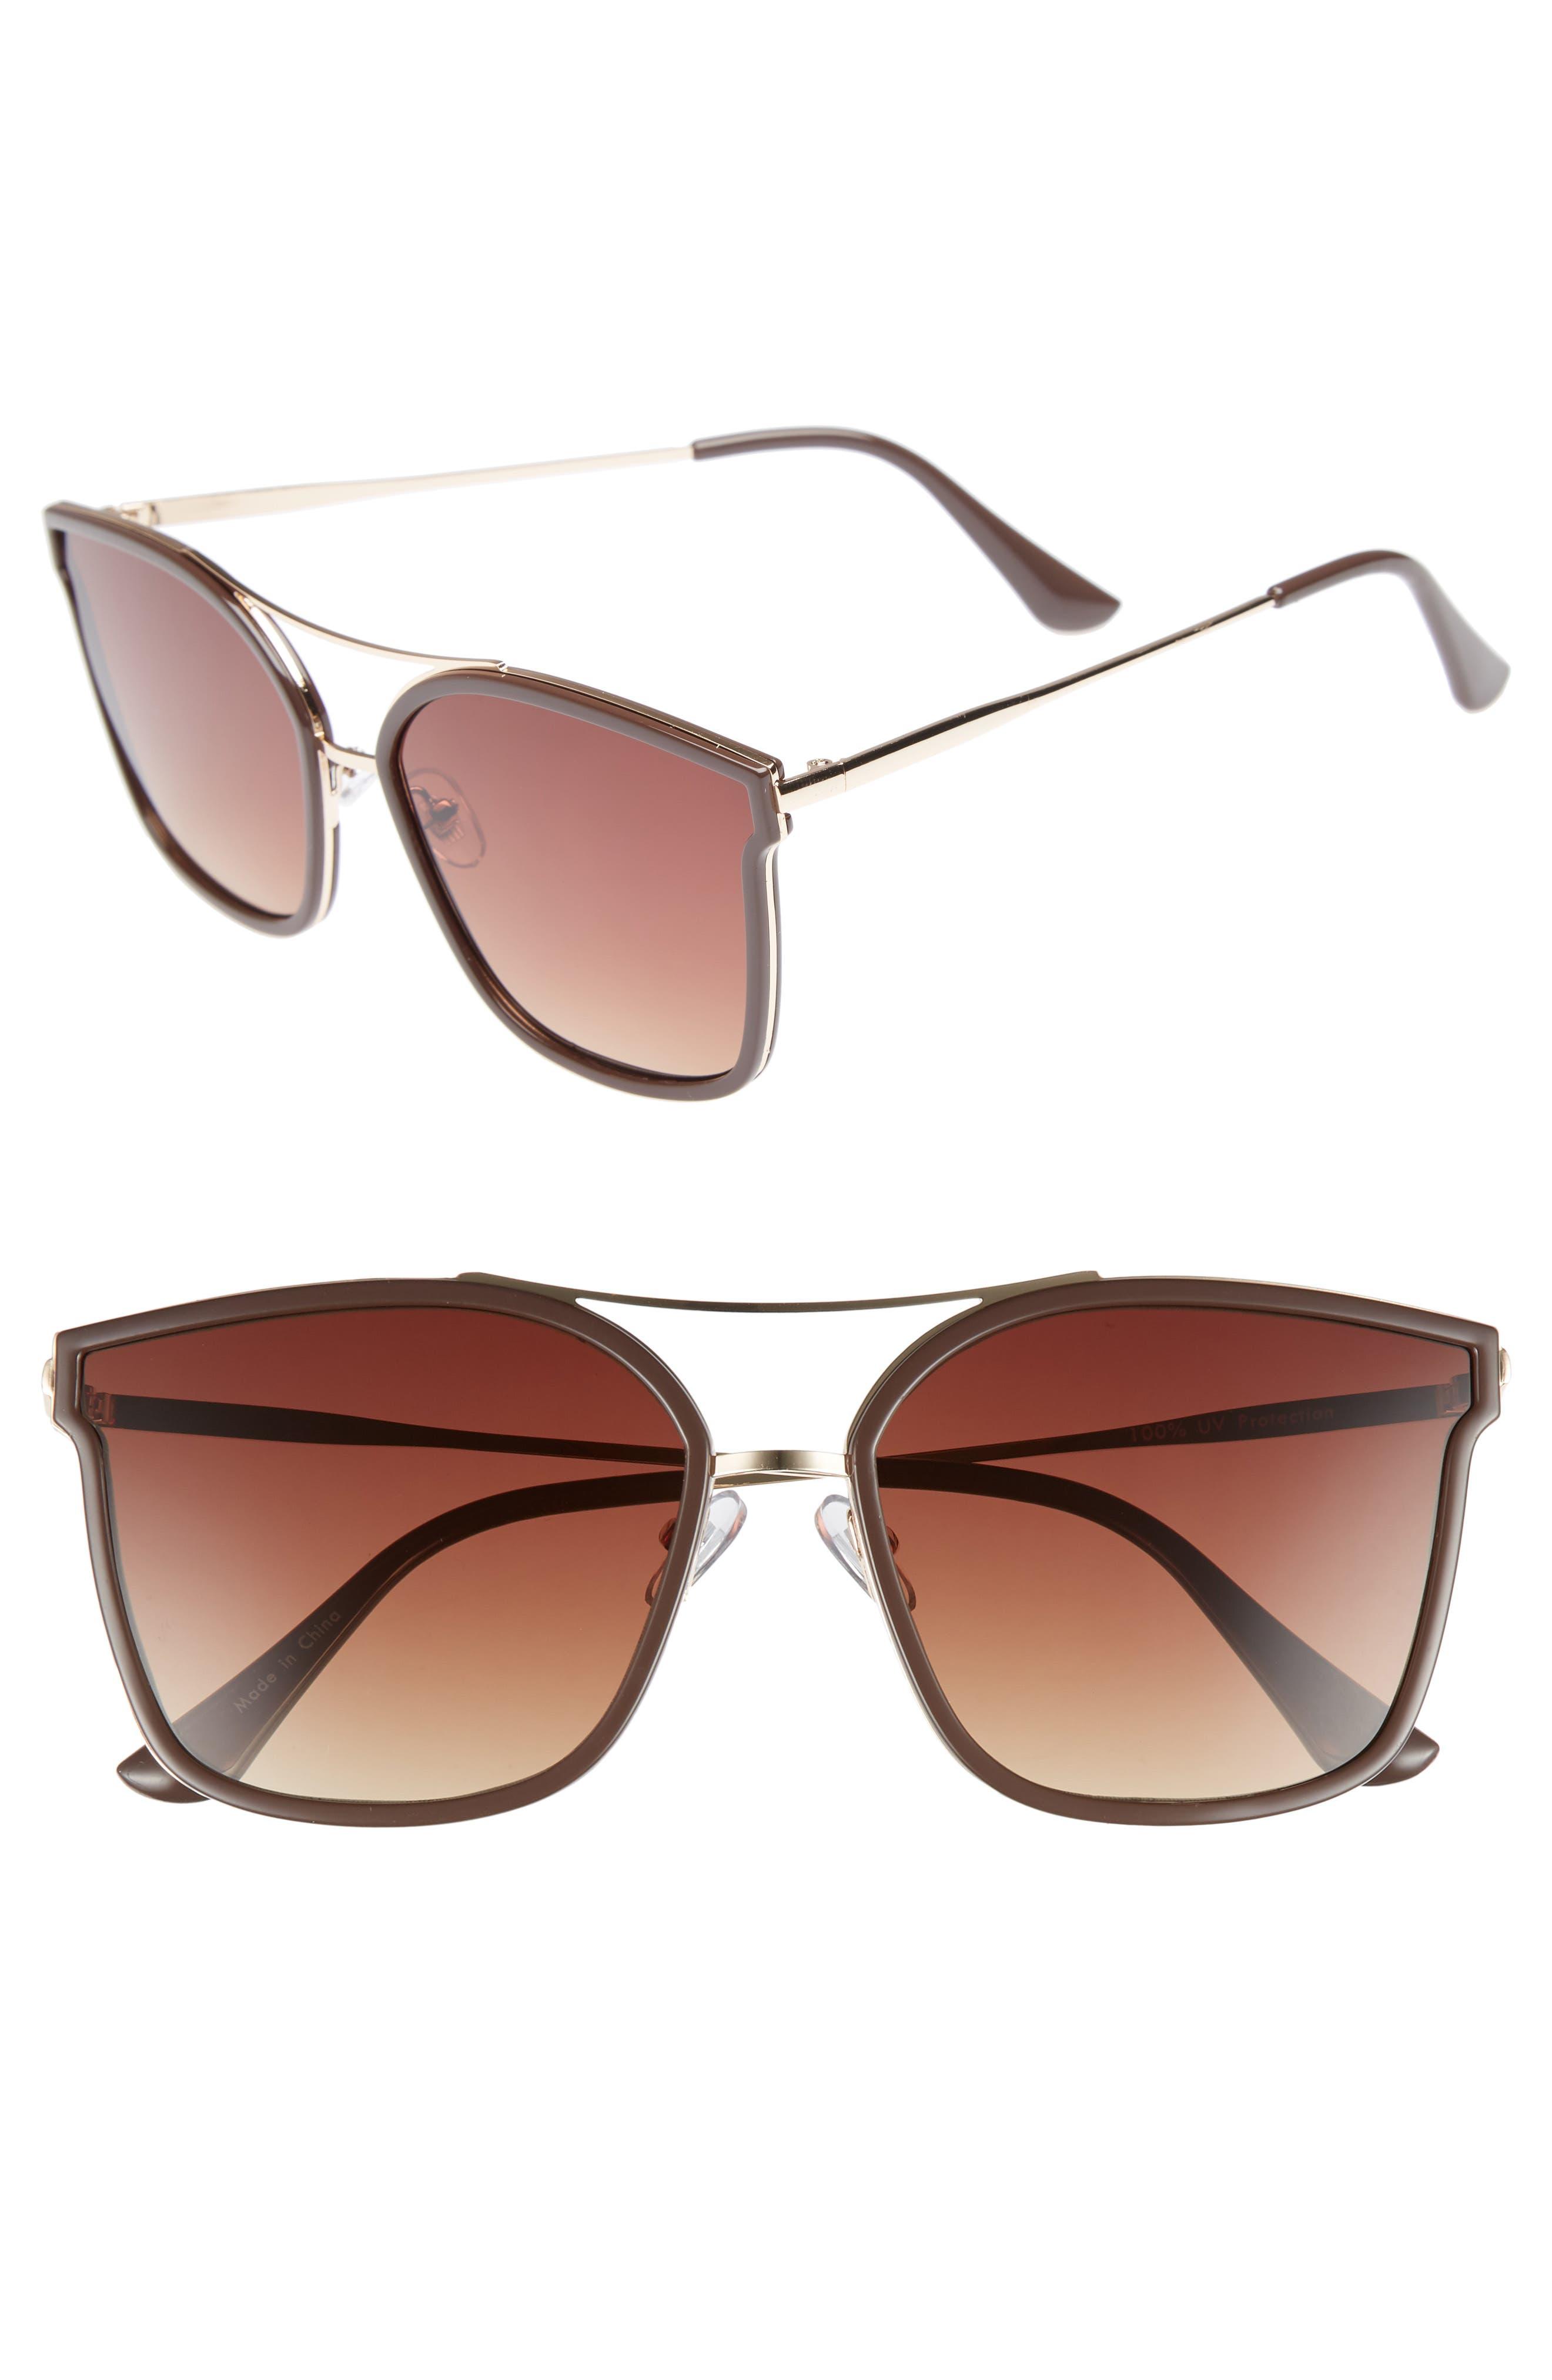 60mm Cat Eye Sunglasses,                             Main thumbnail 1, color,                             Gold/ Brown